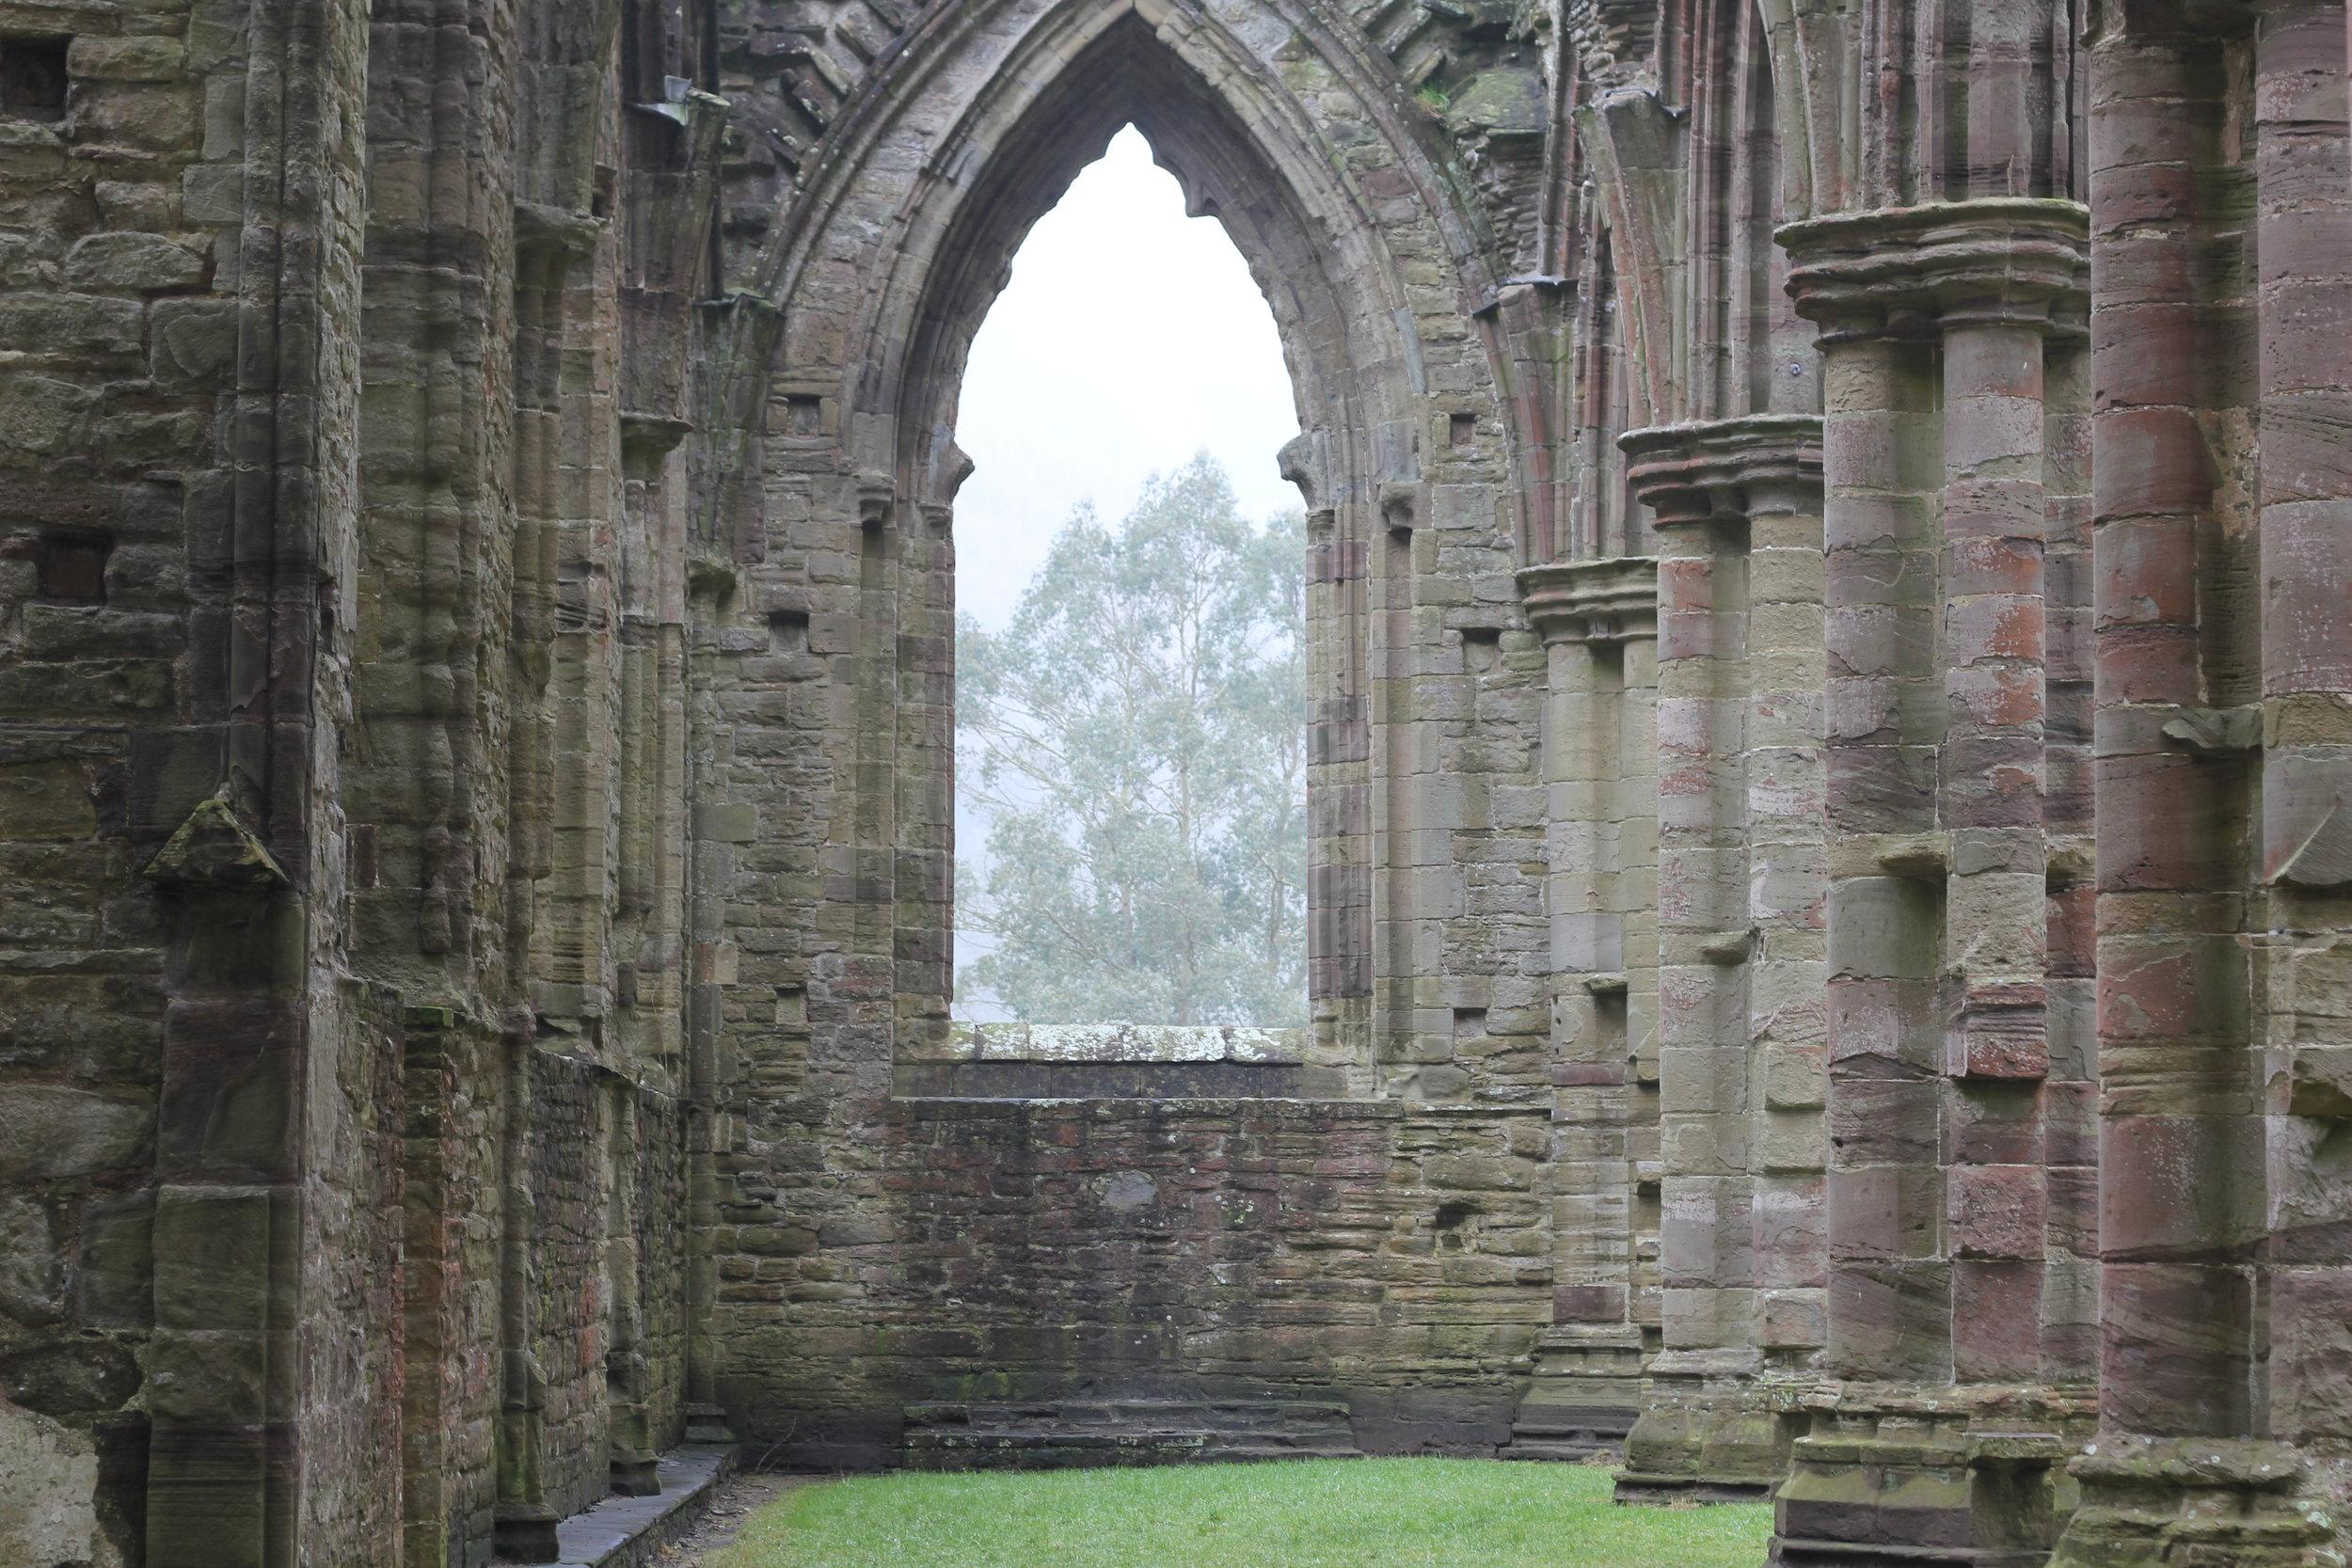 Inside the Welsh Tintern Abbey ruins...